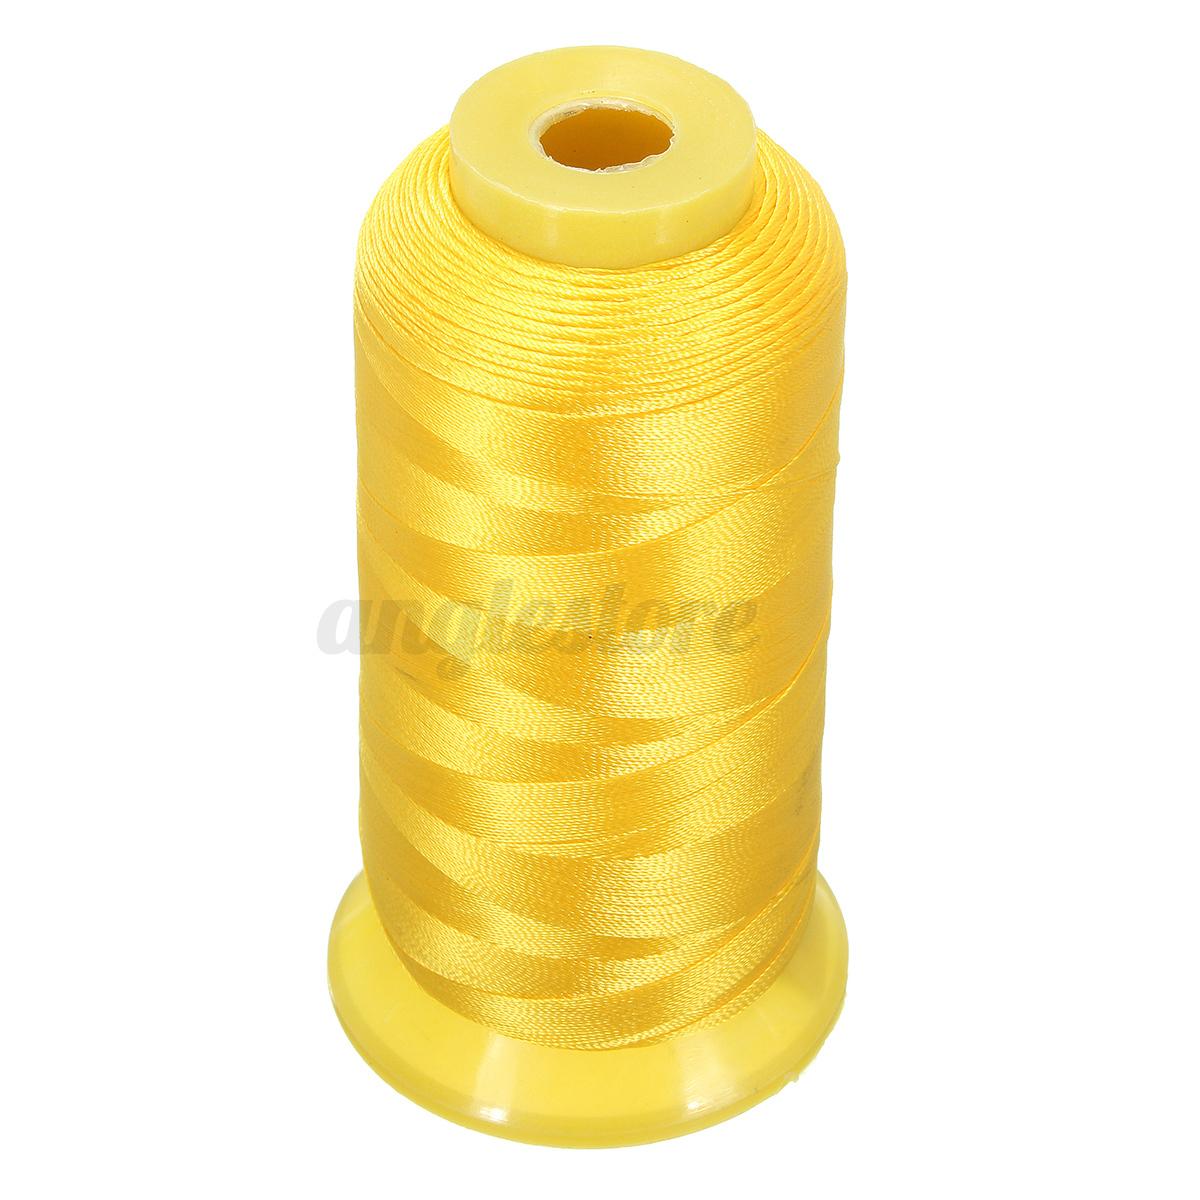 M mm nylon silk beading thread string yarn cord